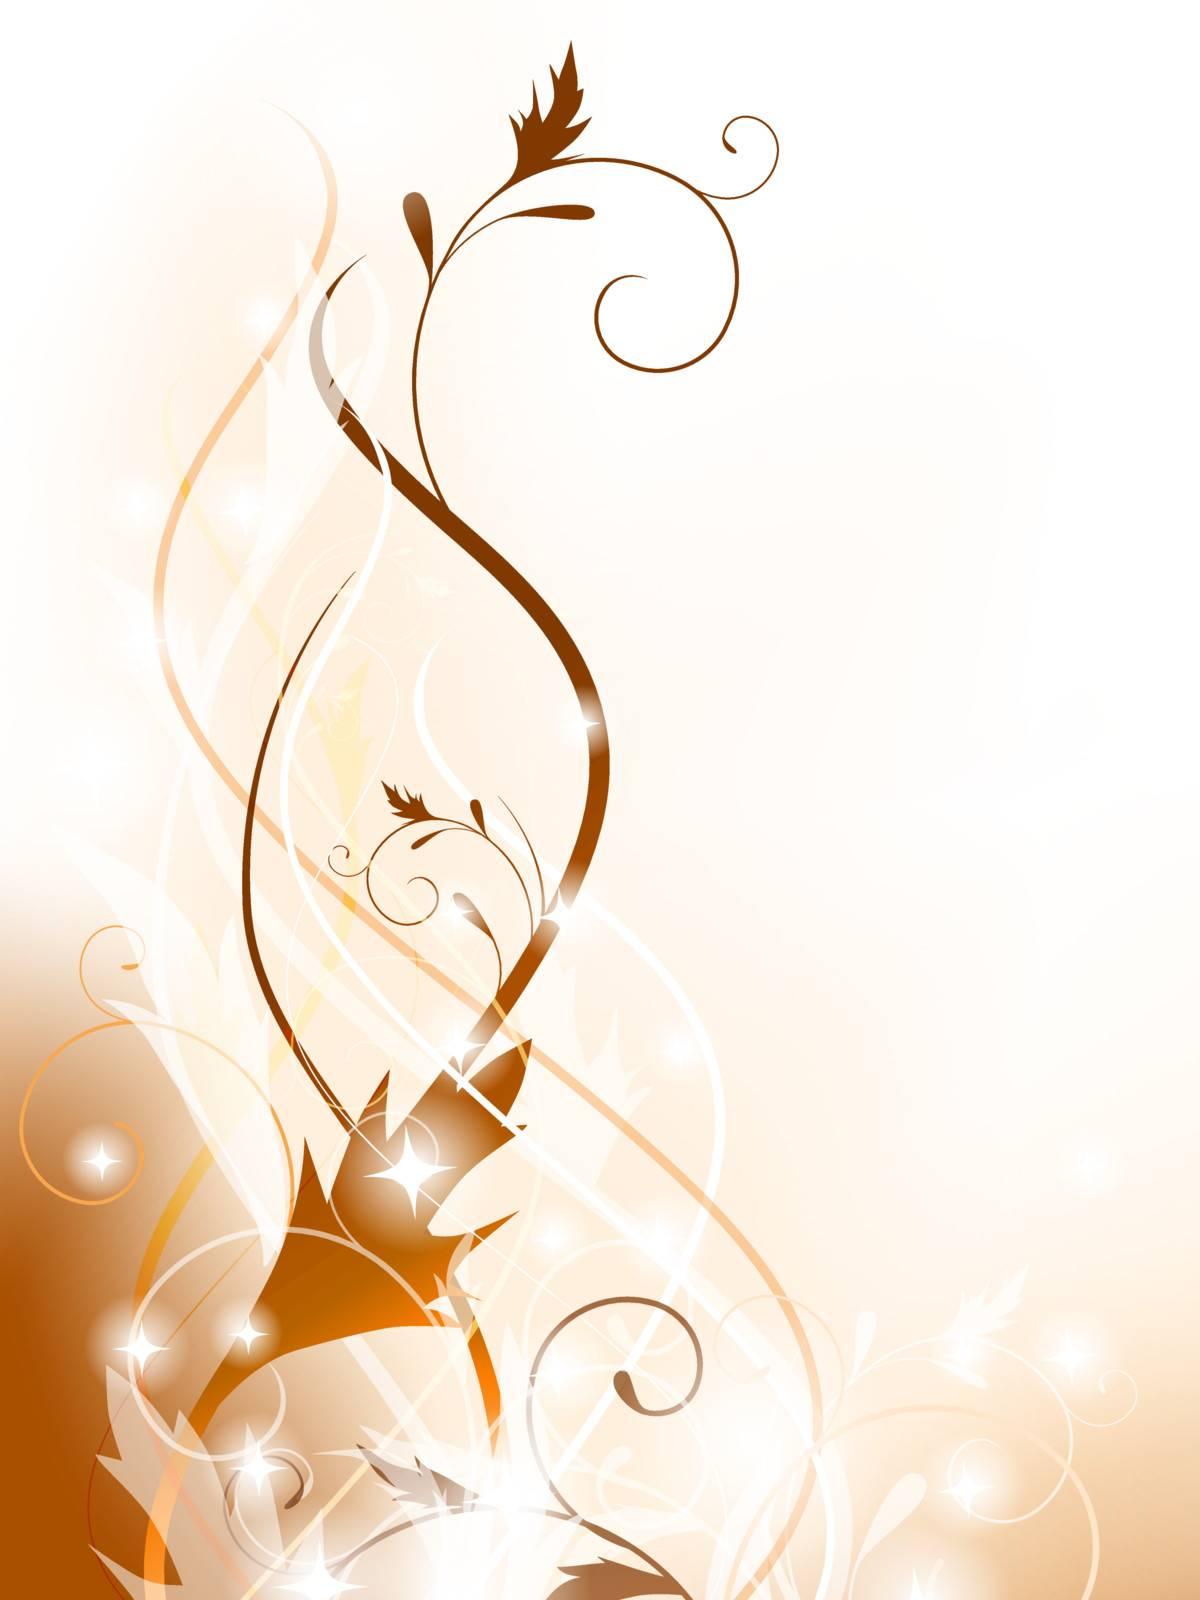 floral swirl decoration element in beige, EPS10